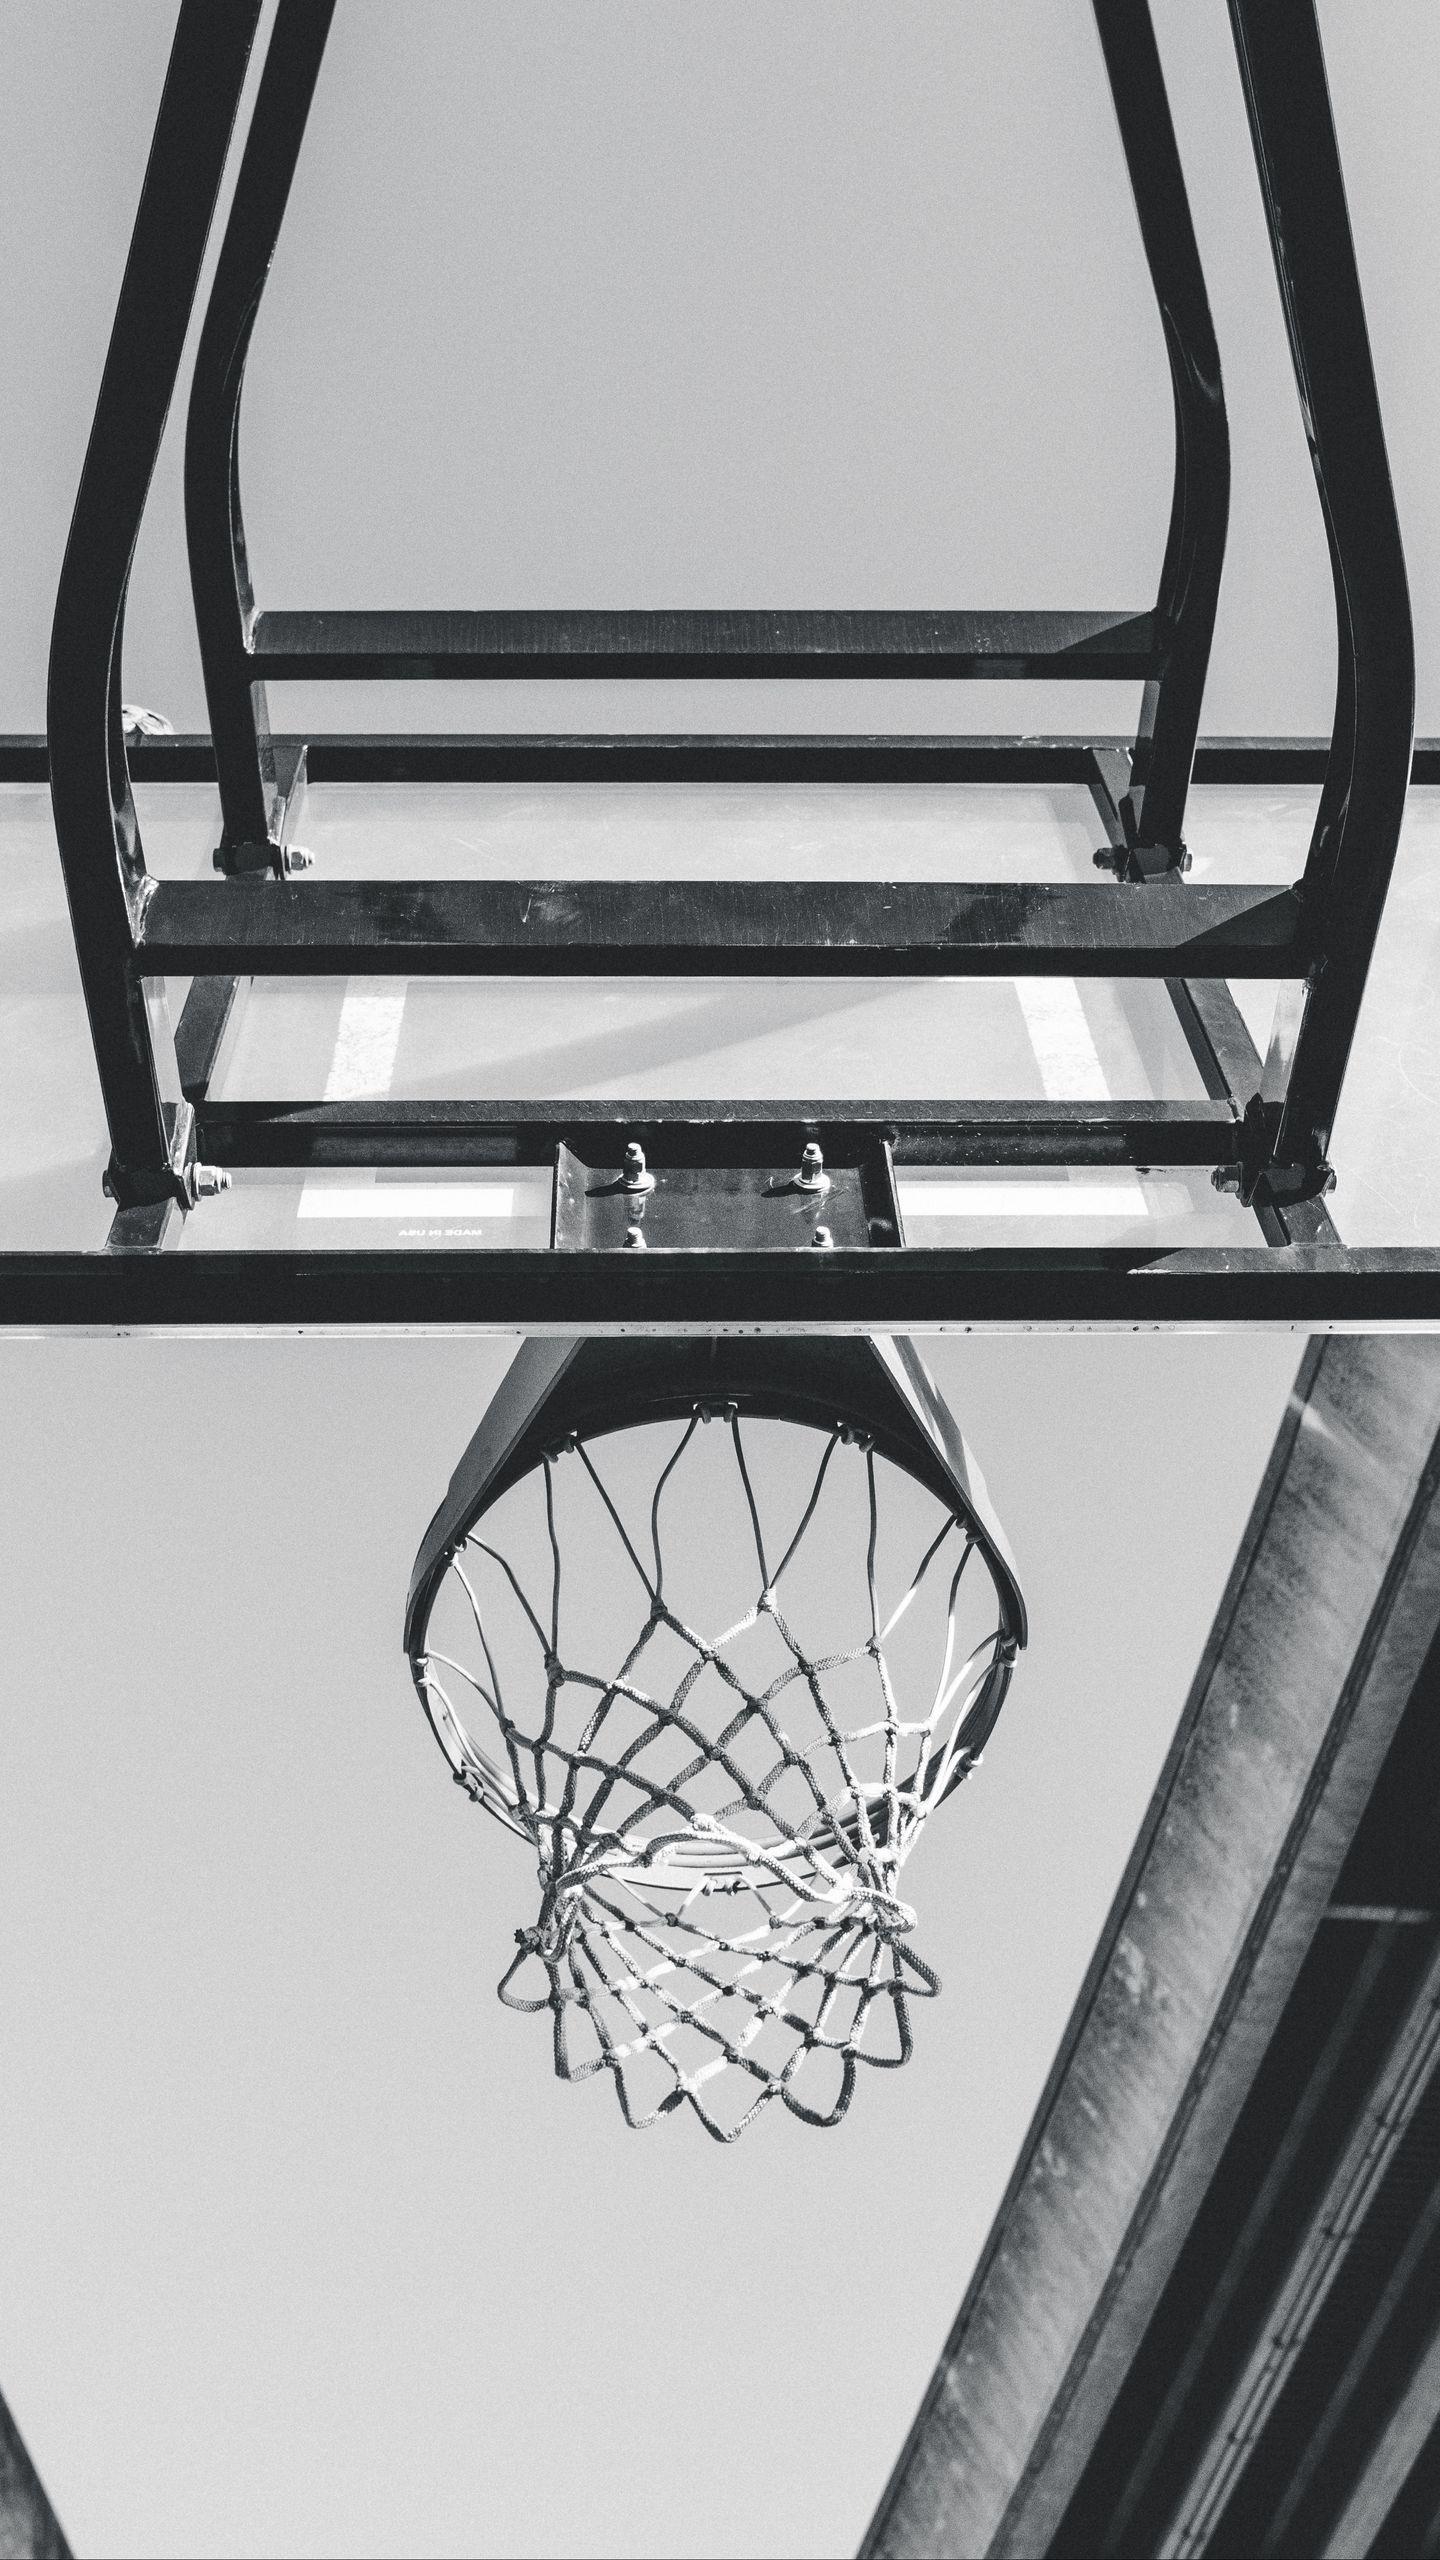 1440x2560 Wallpaper basketball, ring, mesh, bw